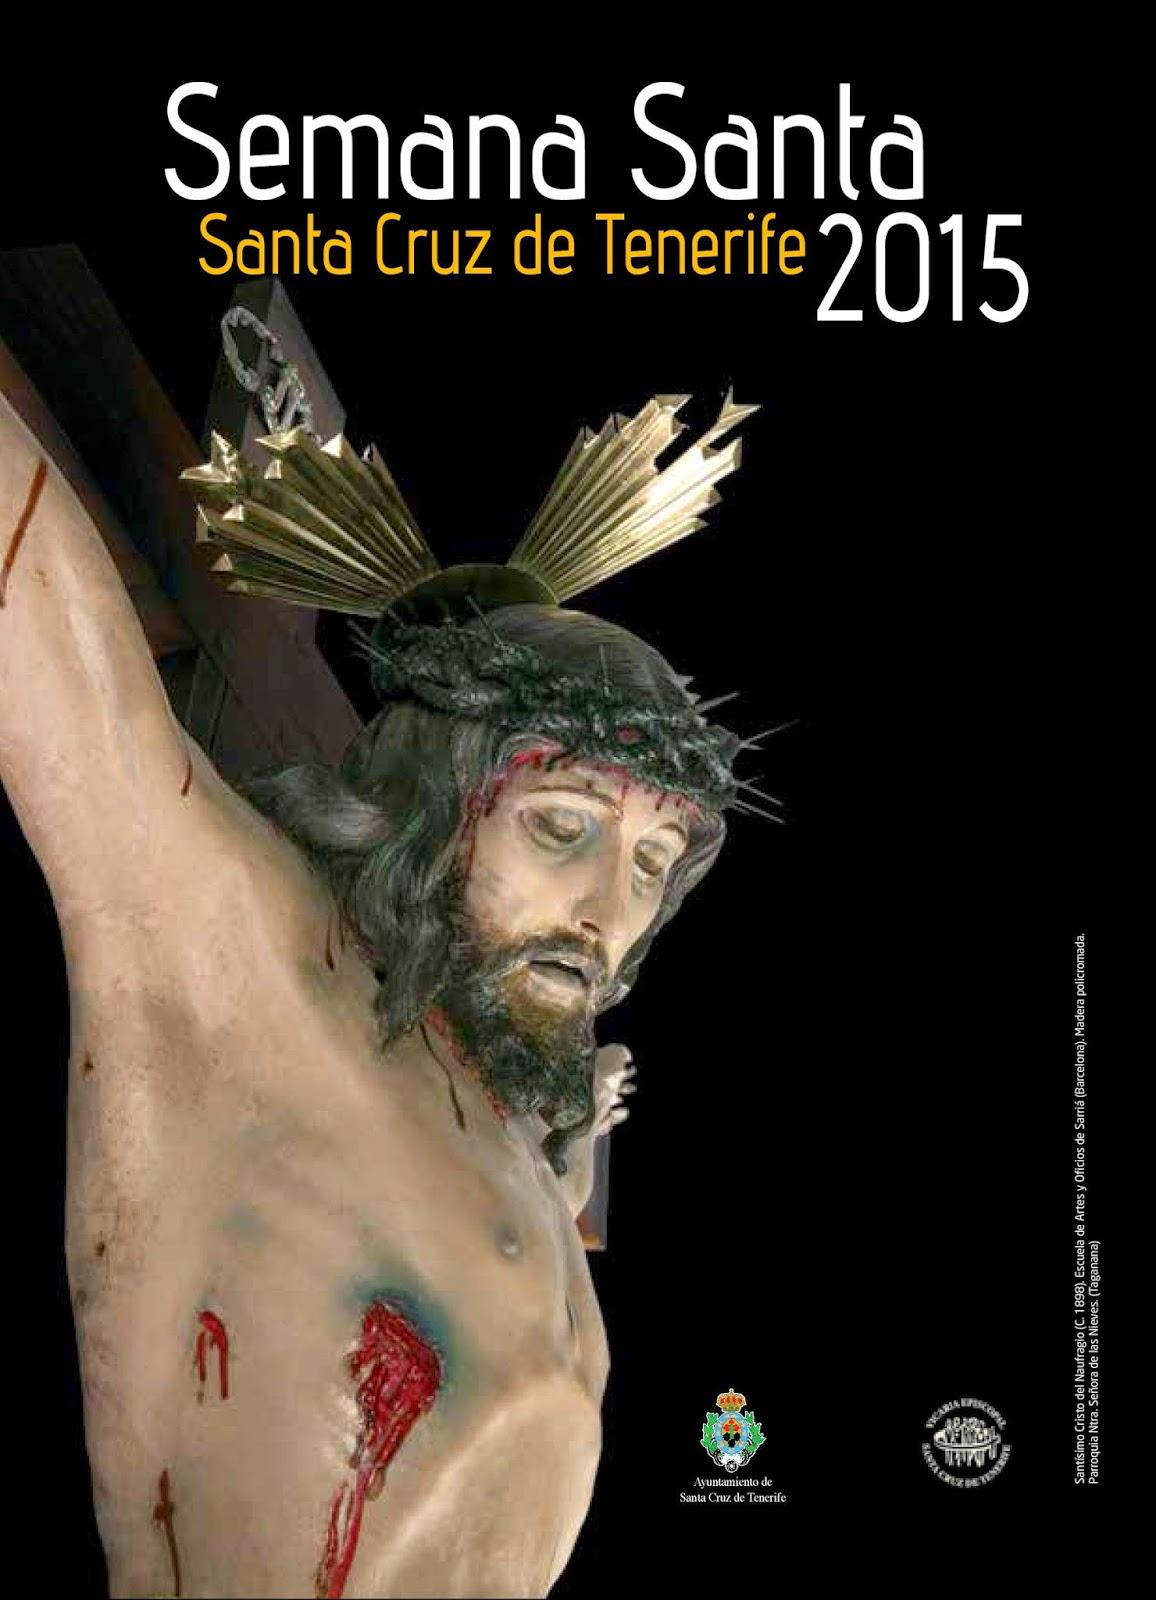 http://www.santacruzdetenerife.es/uploads/tx_cal/media/Programa2015.pdf